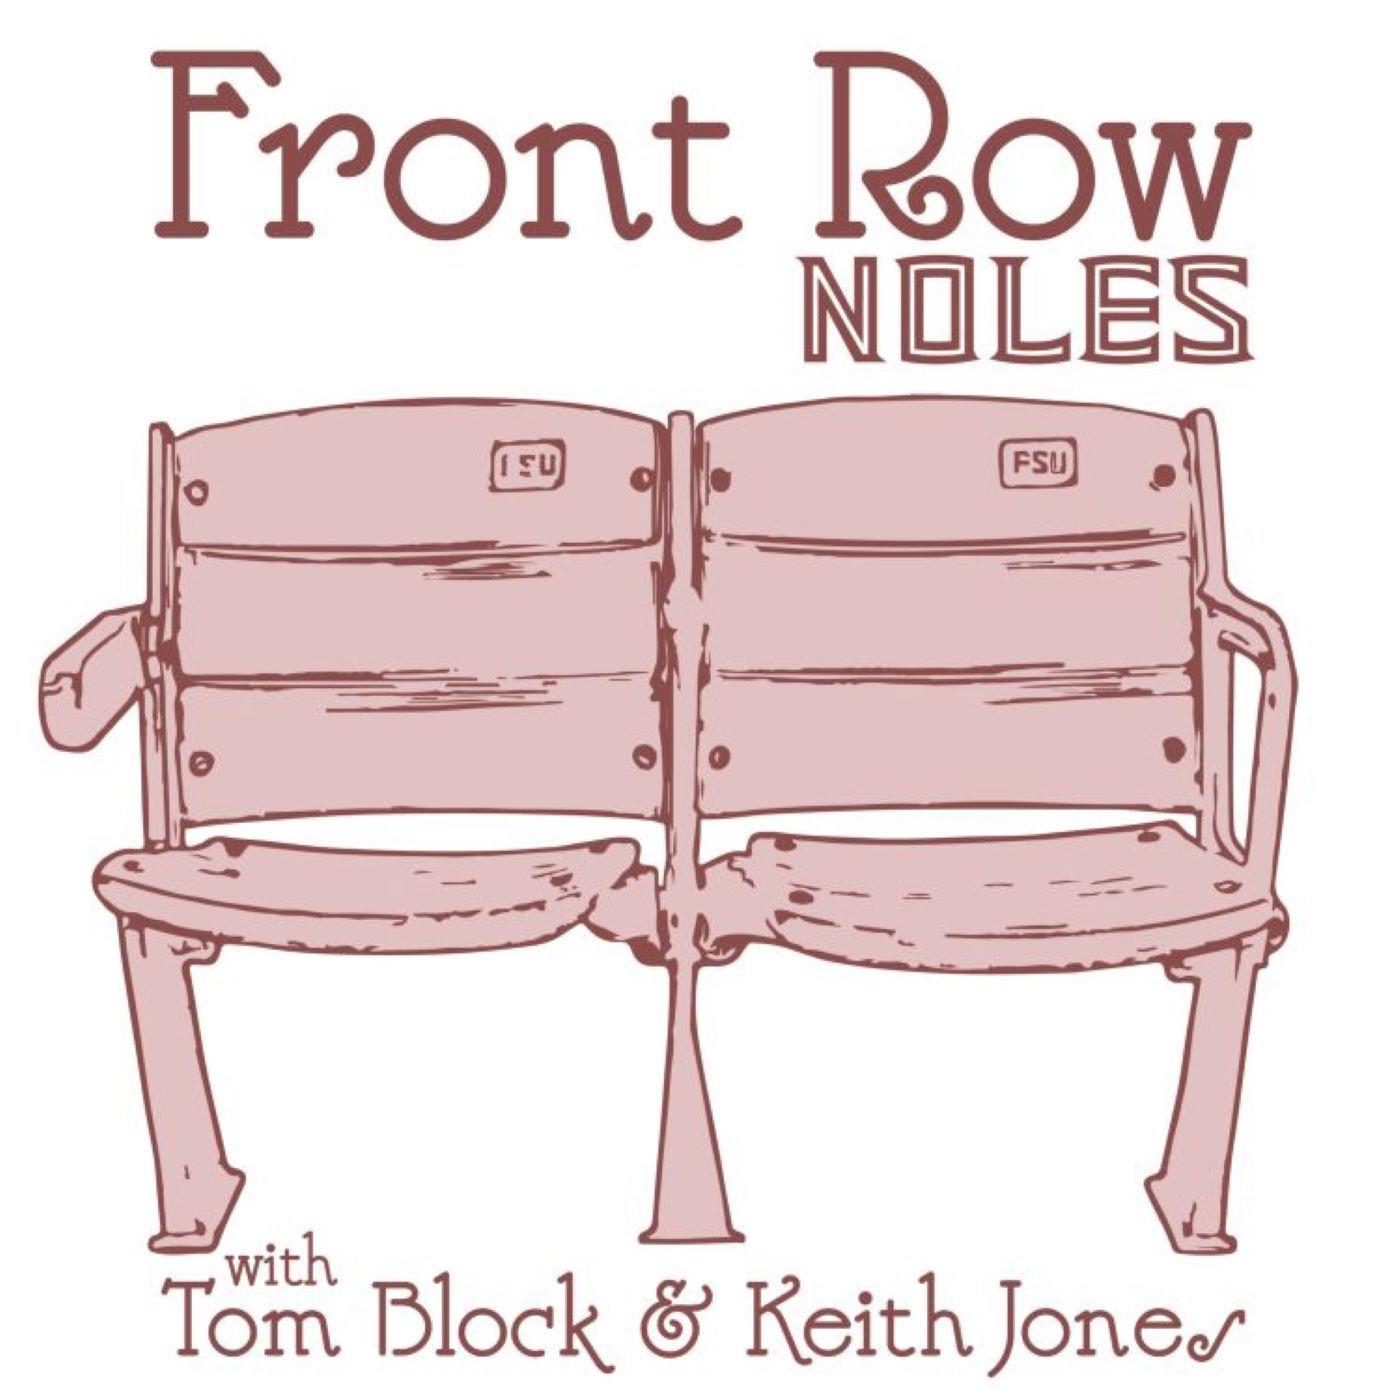 Front Row Noles